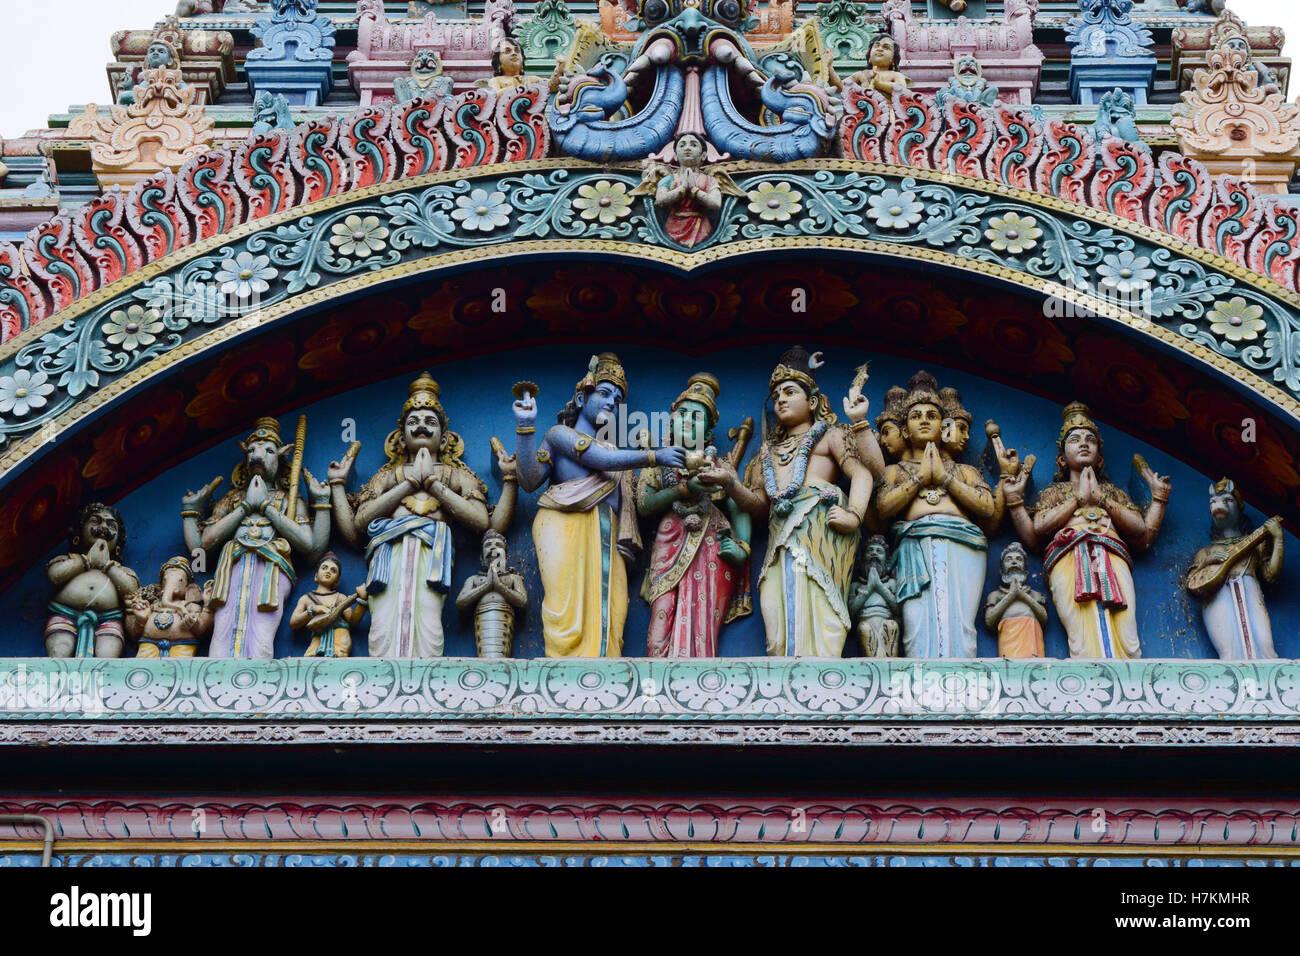 Madurai datiert Mädchen